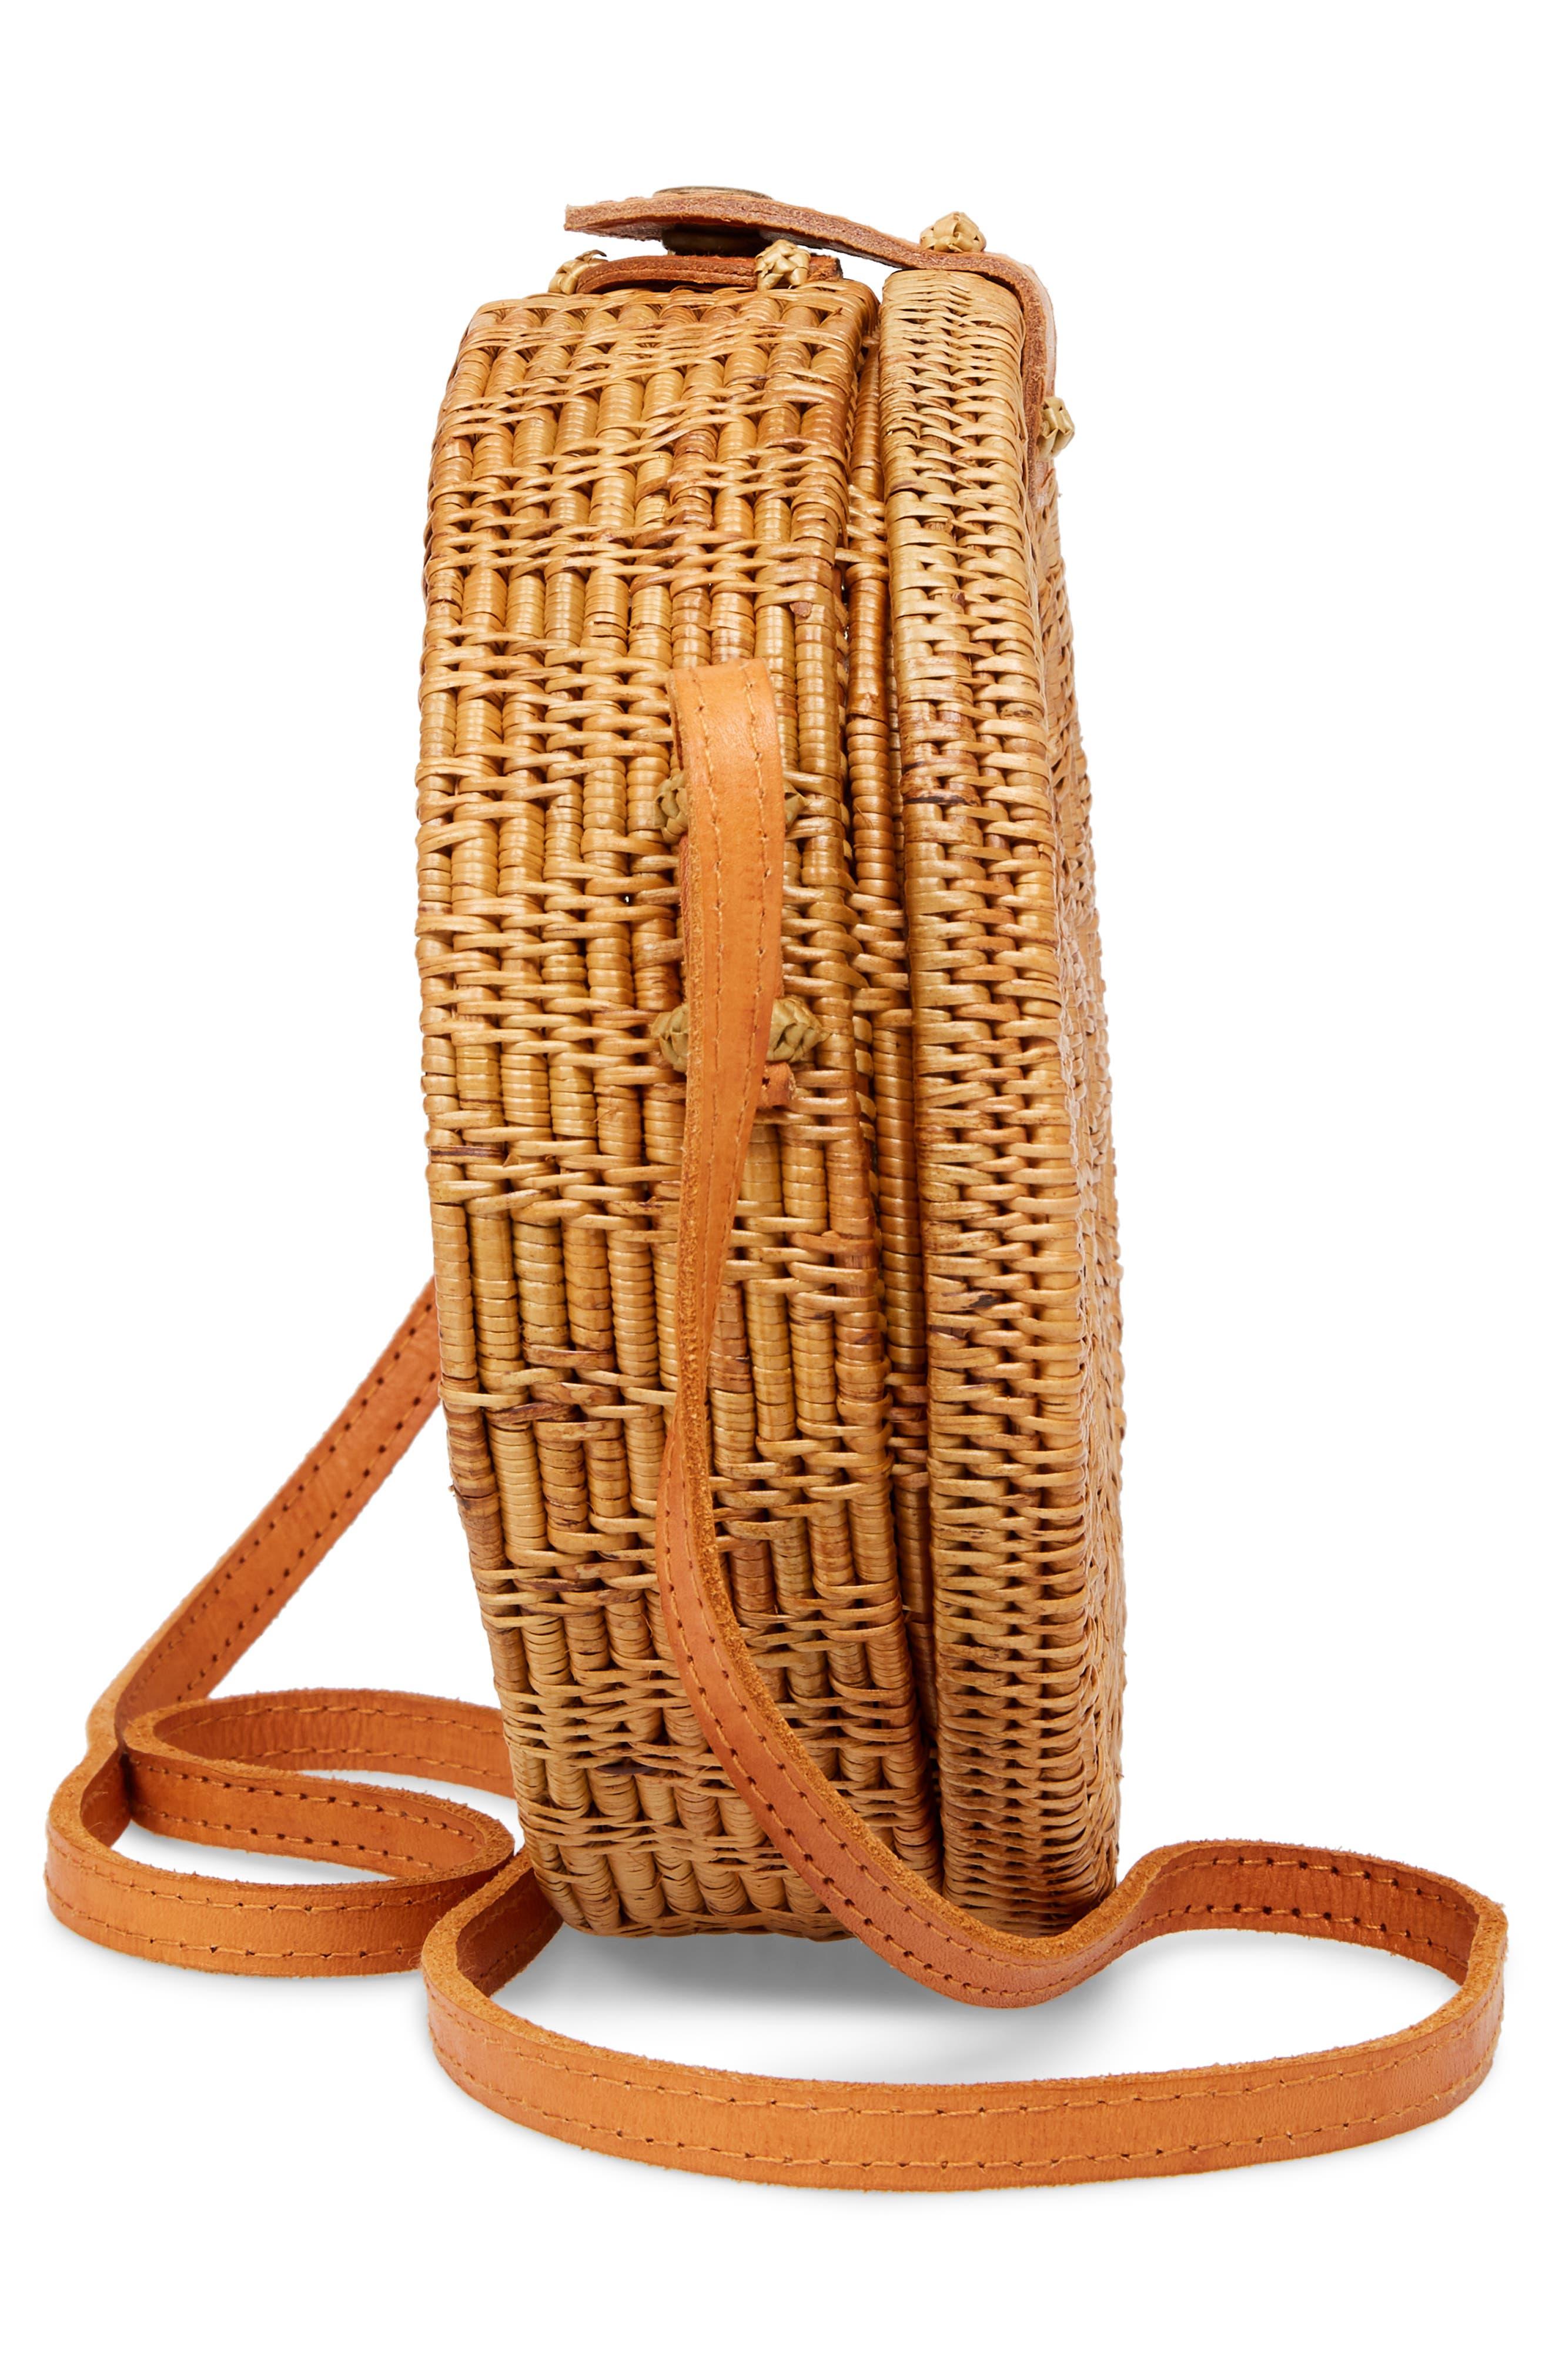 Woven Rattan Circle Basket Crossbody,                             Alternate thumbnail 5, color,                             Tan